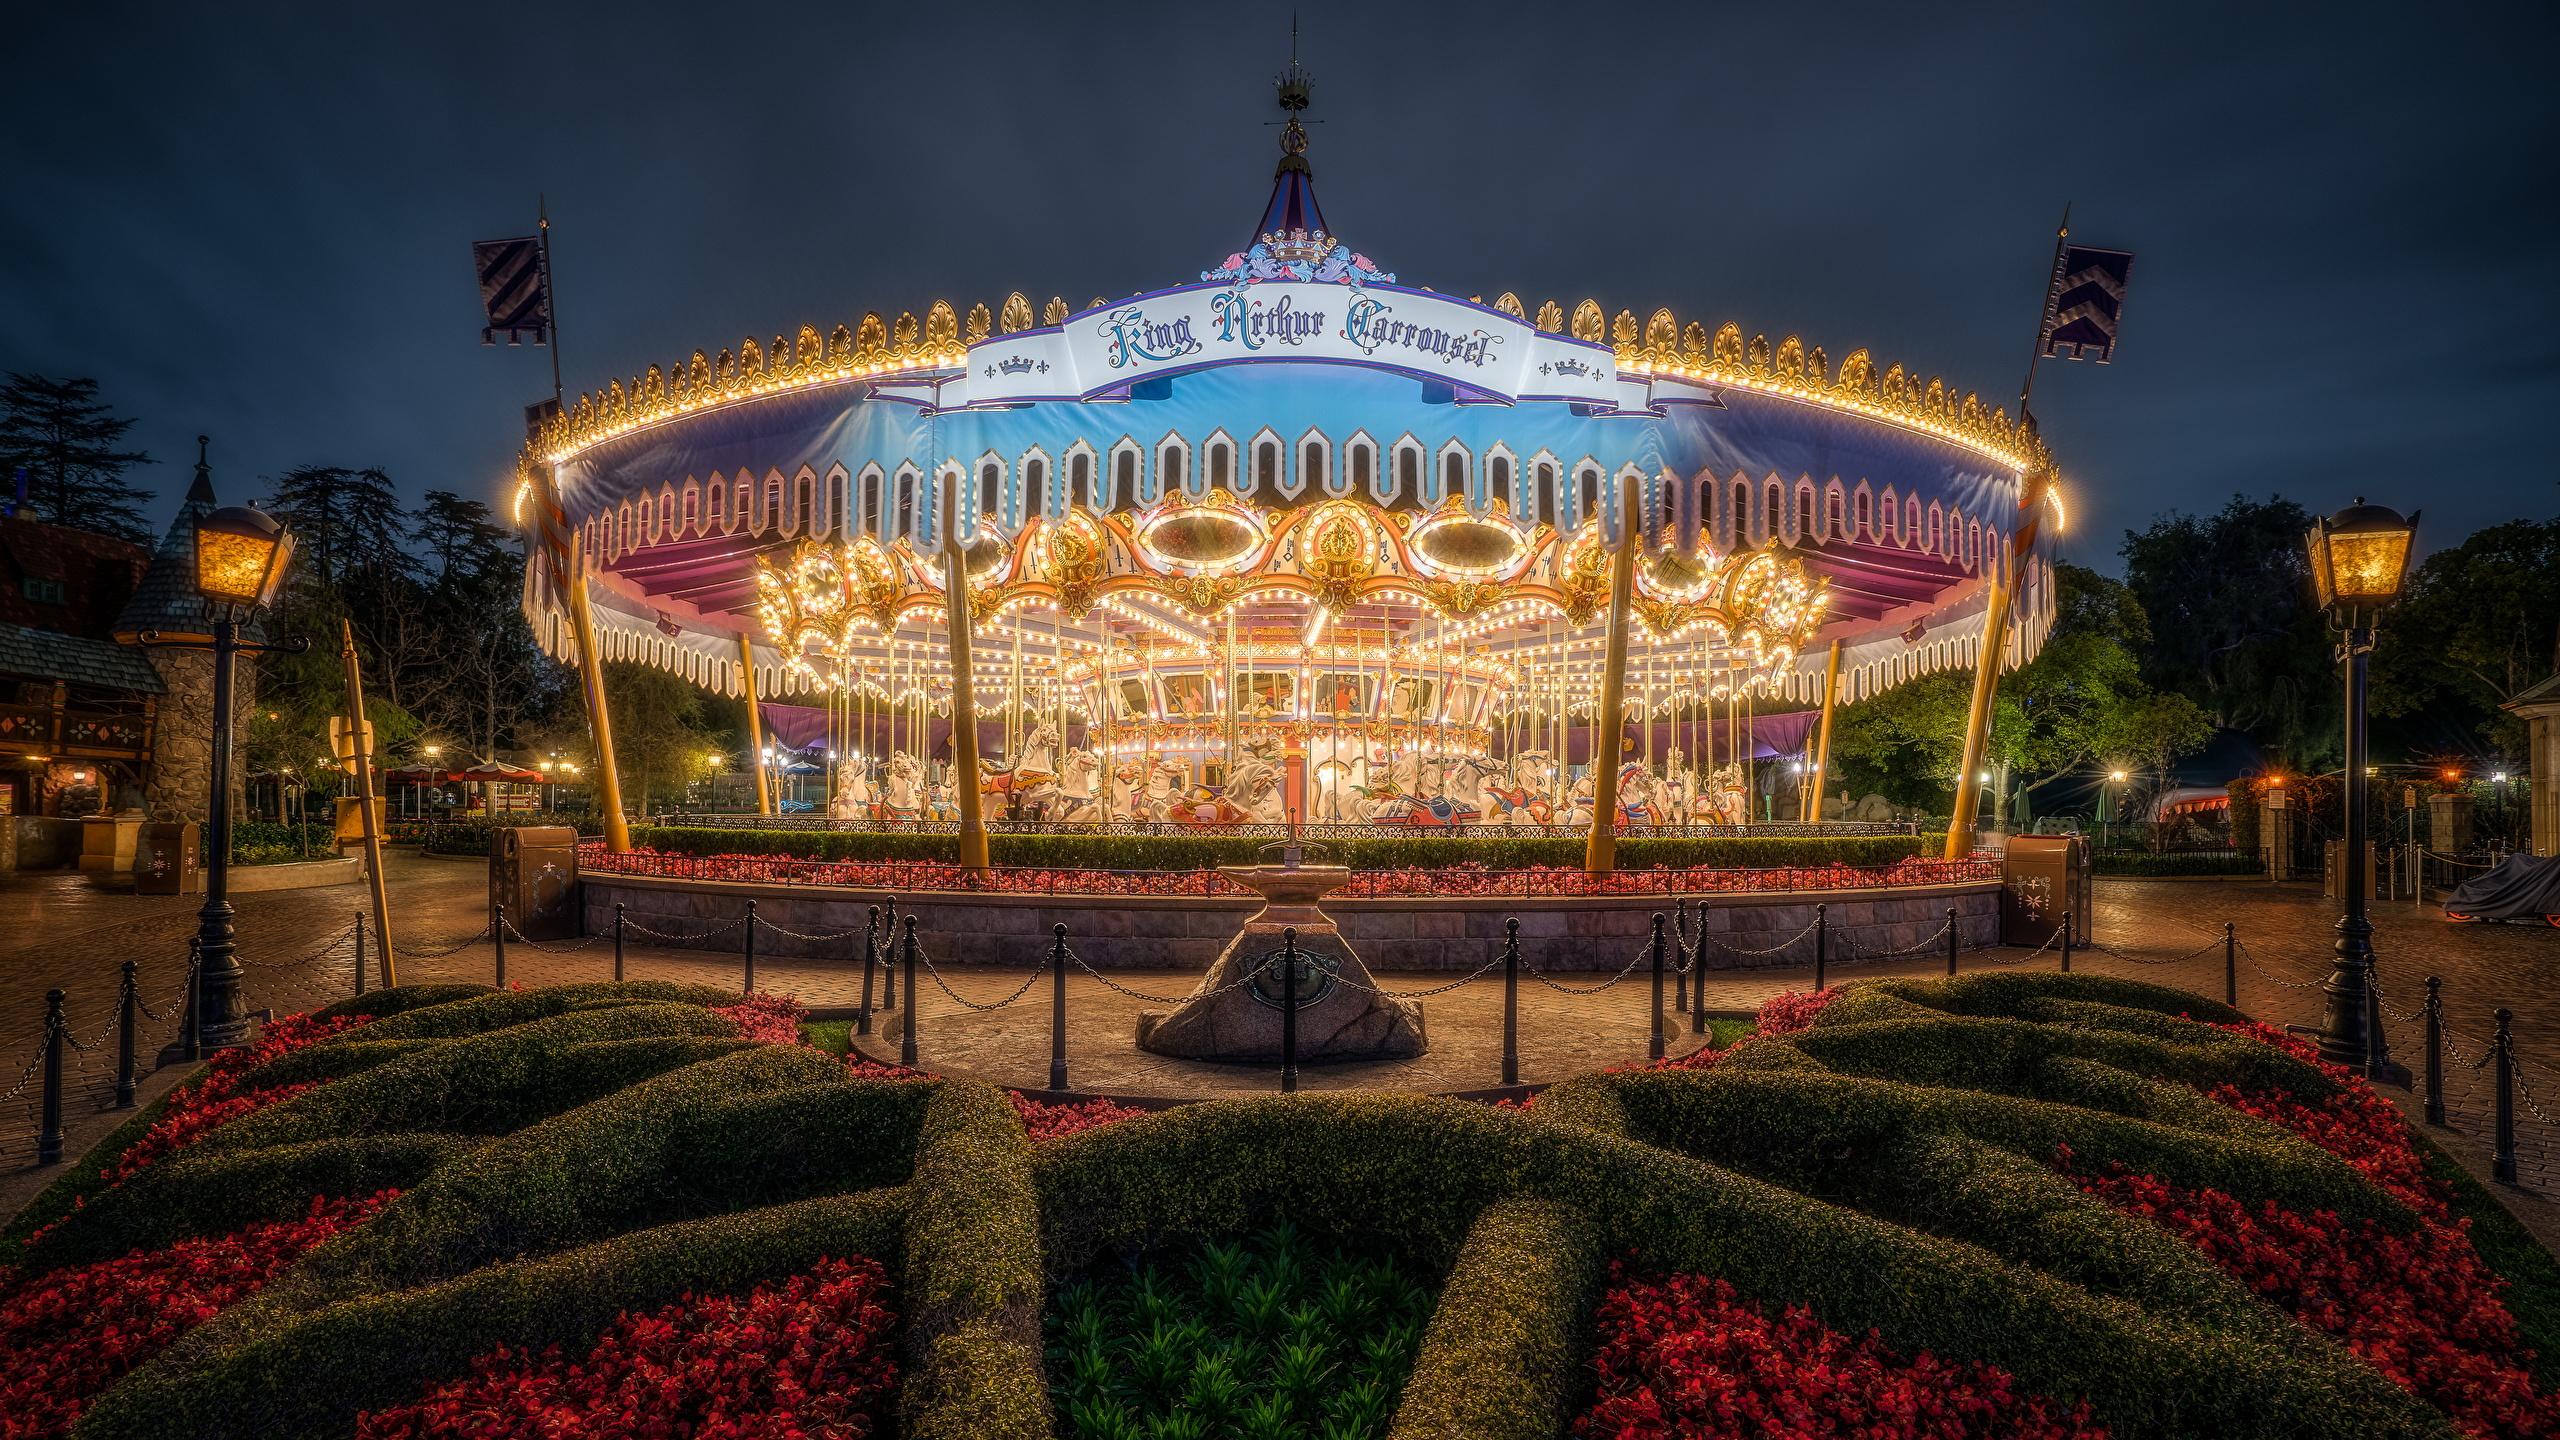 Desktop Wallpapers Anaheim California Disneyland Usa King 2560x1440